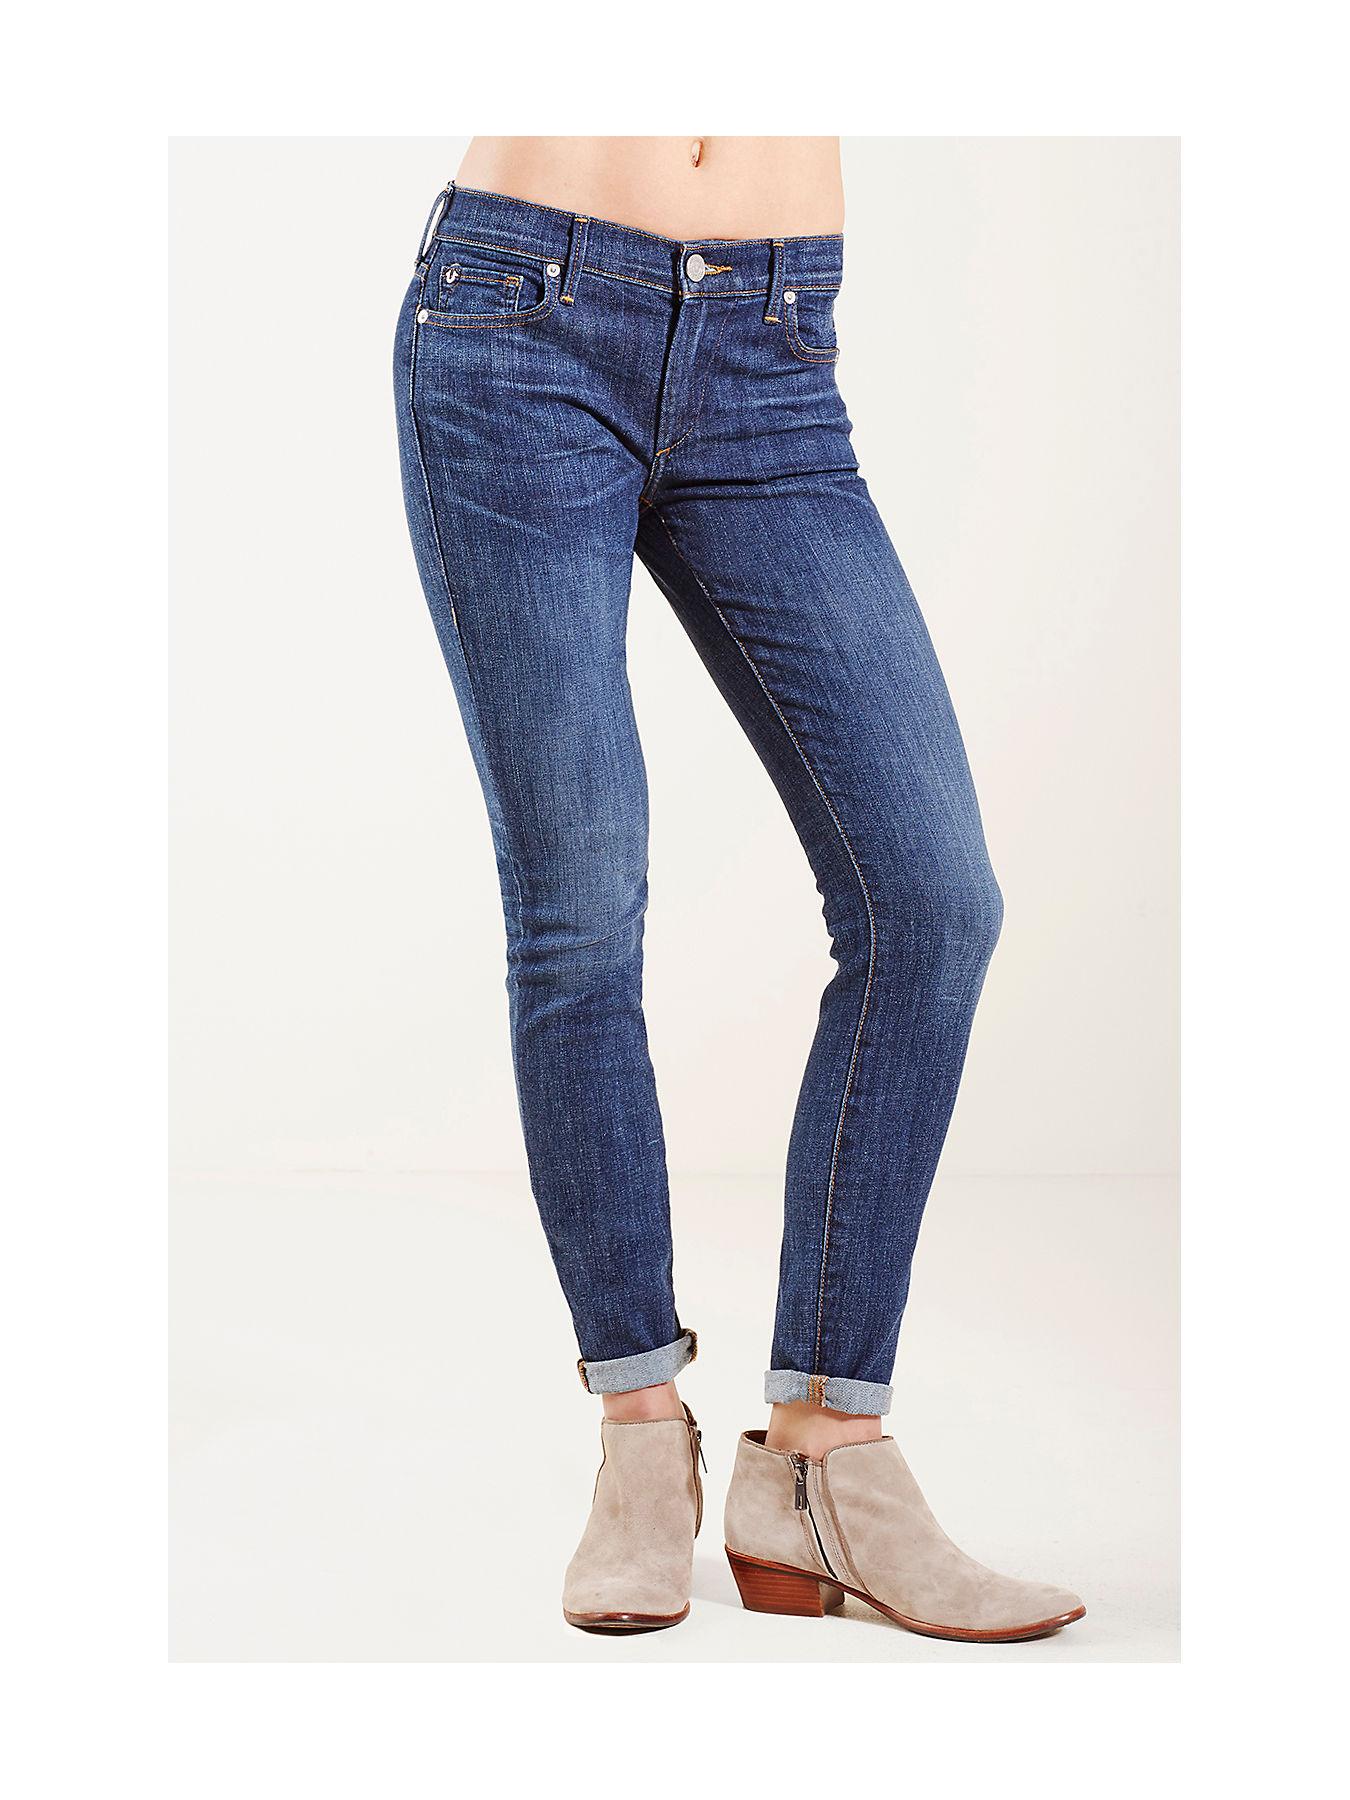 Halle Mid Rise Super Skinny Womens Jean